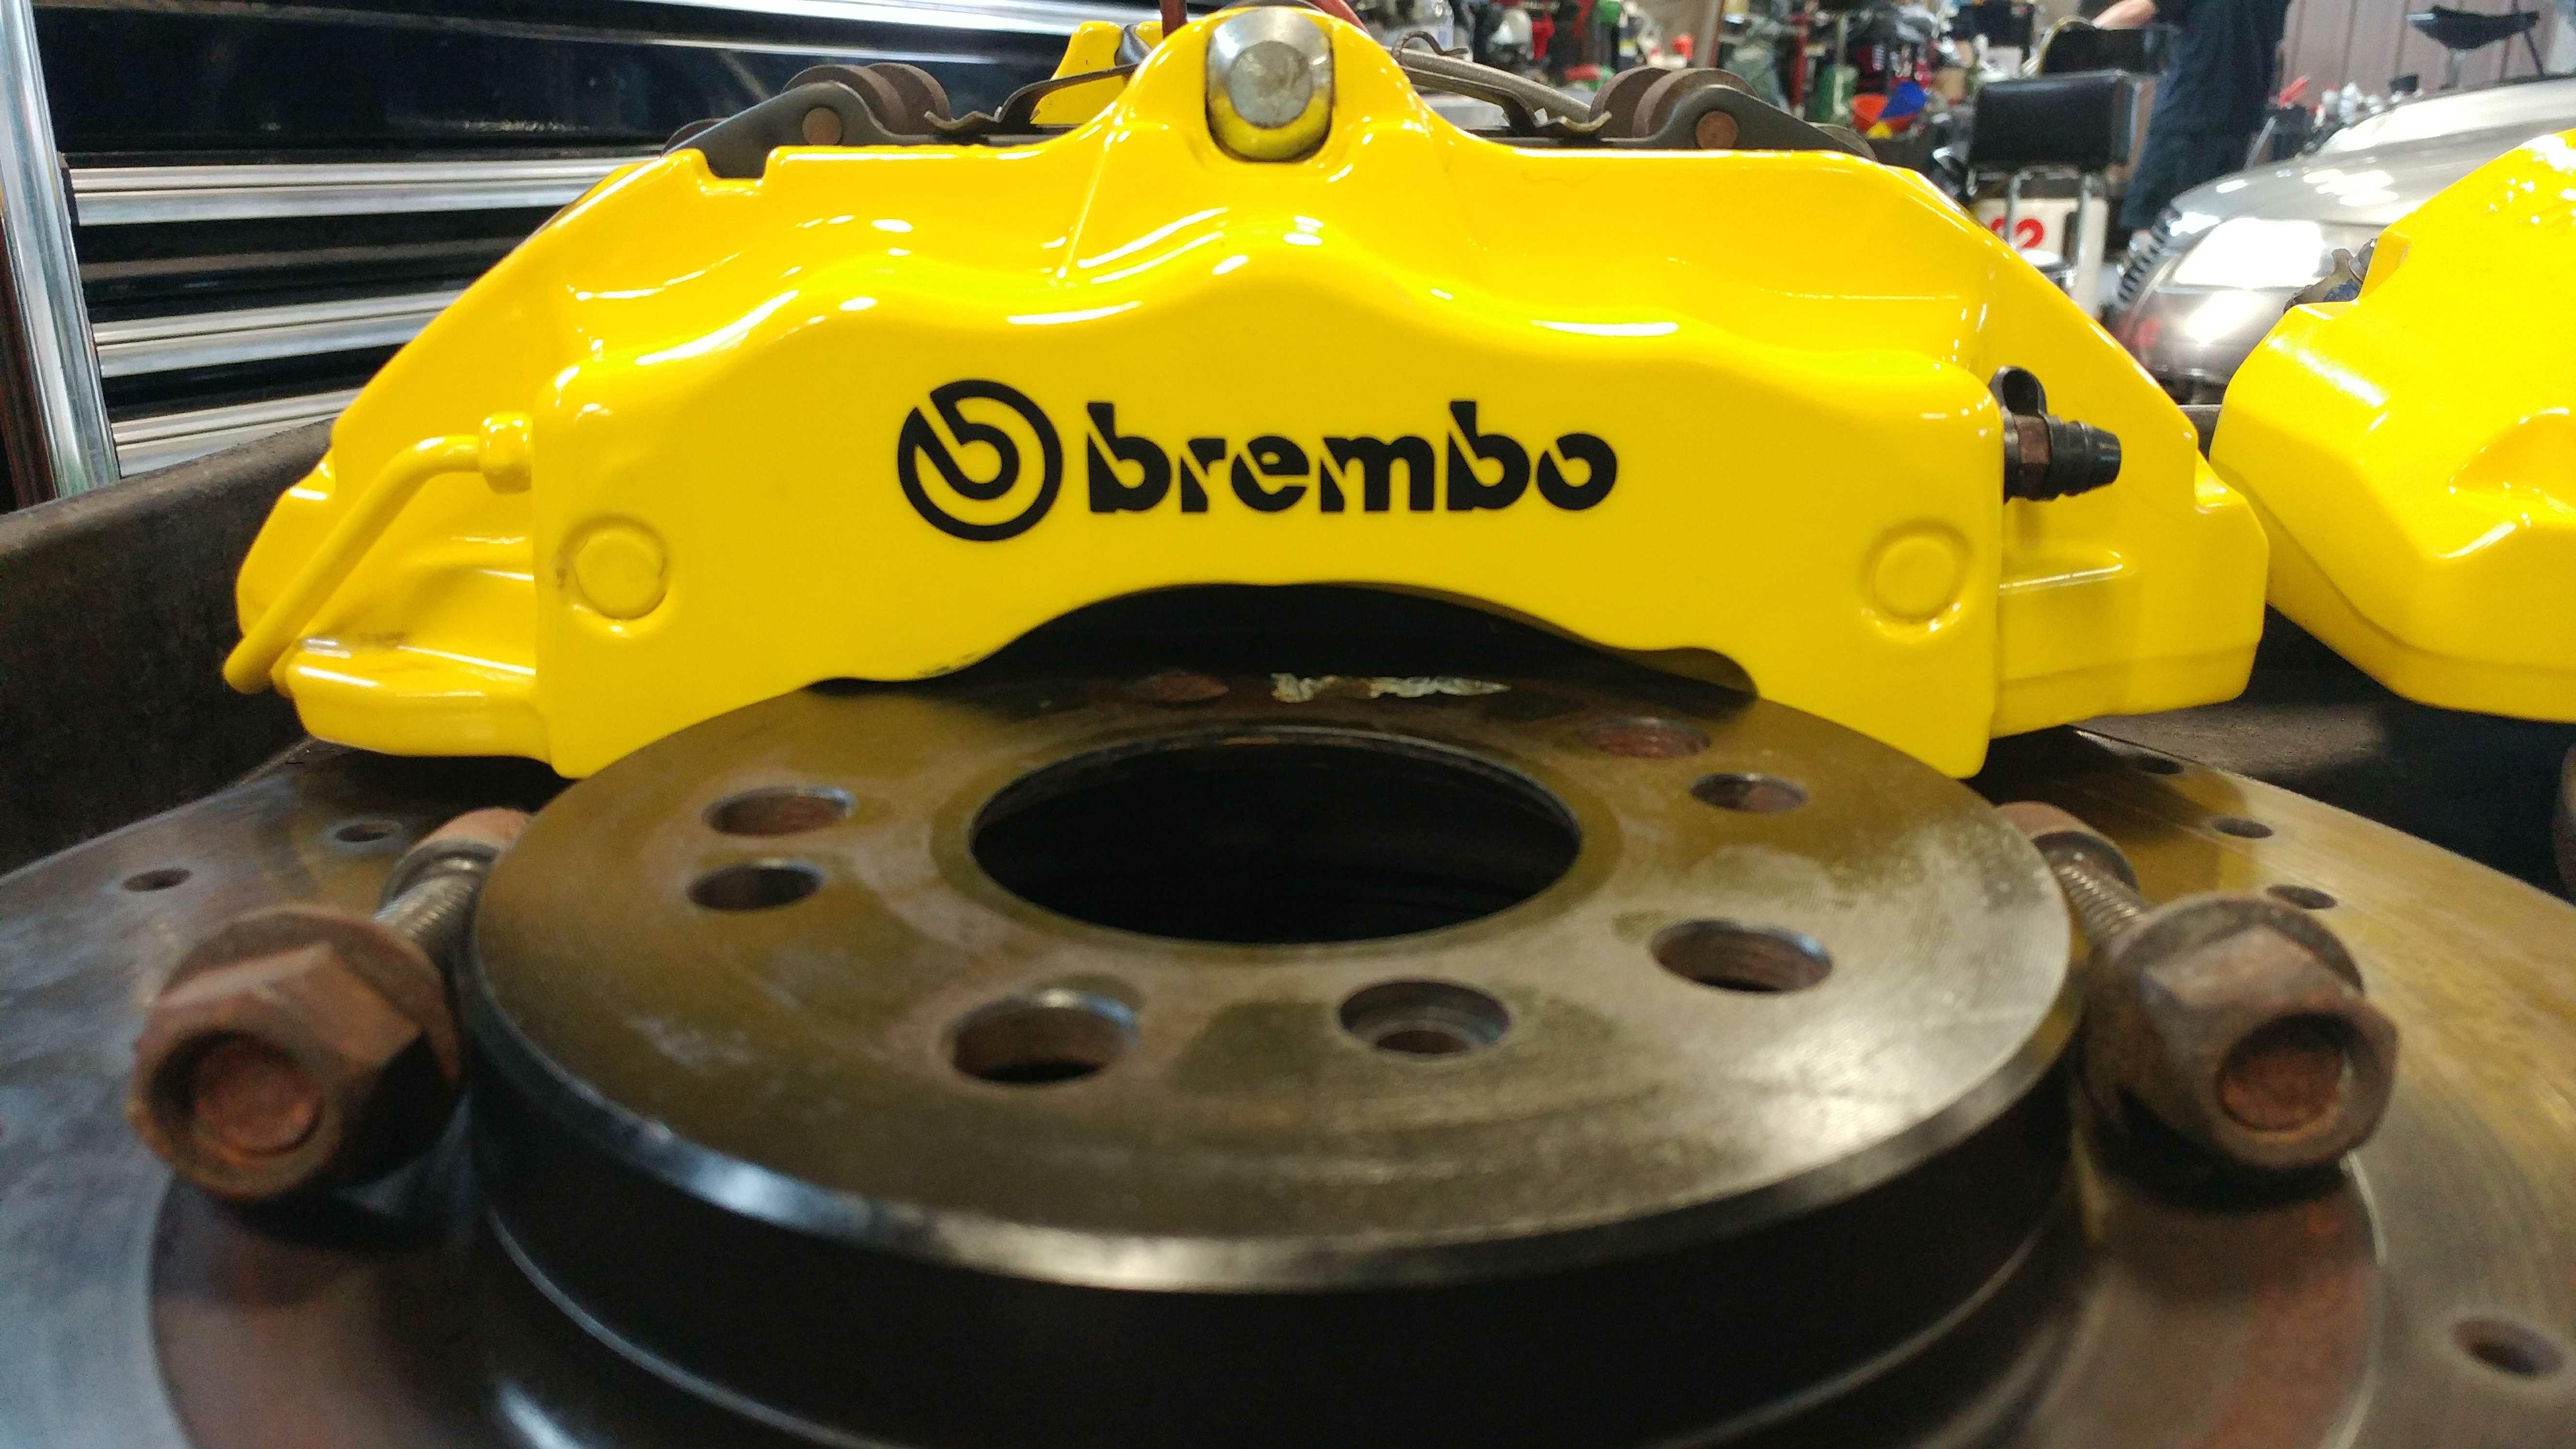 2017 Vw Gli >> VWVortex.com - FS: 18z Brembo BBK with pads and rotors